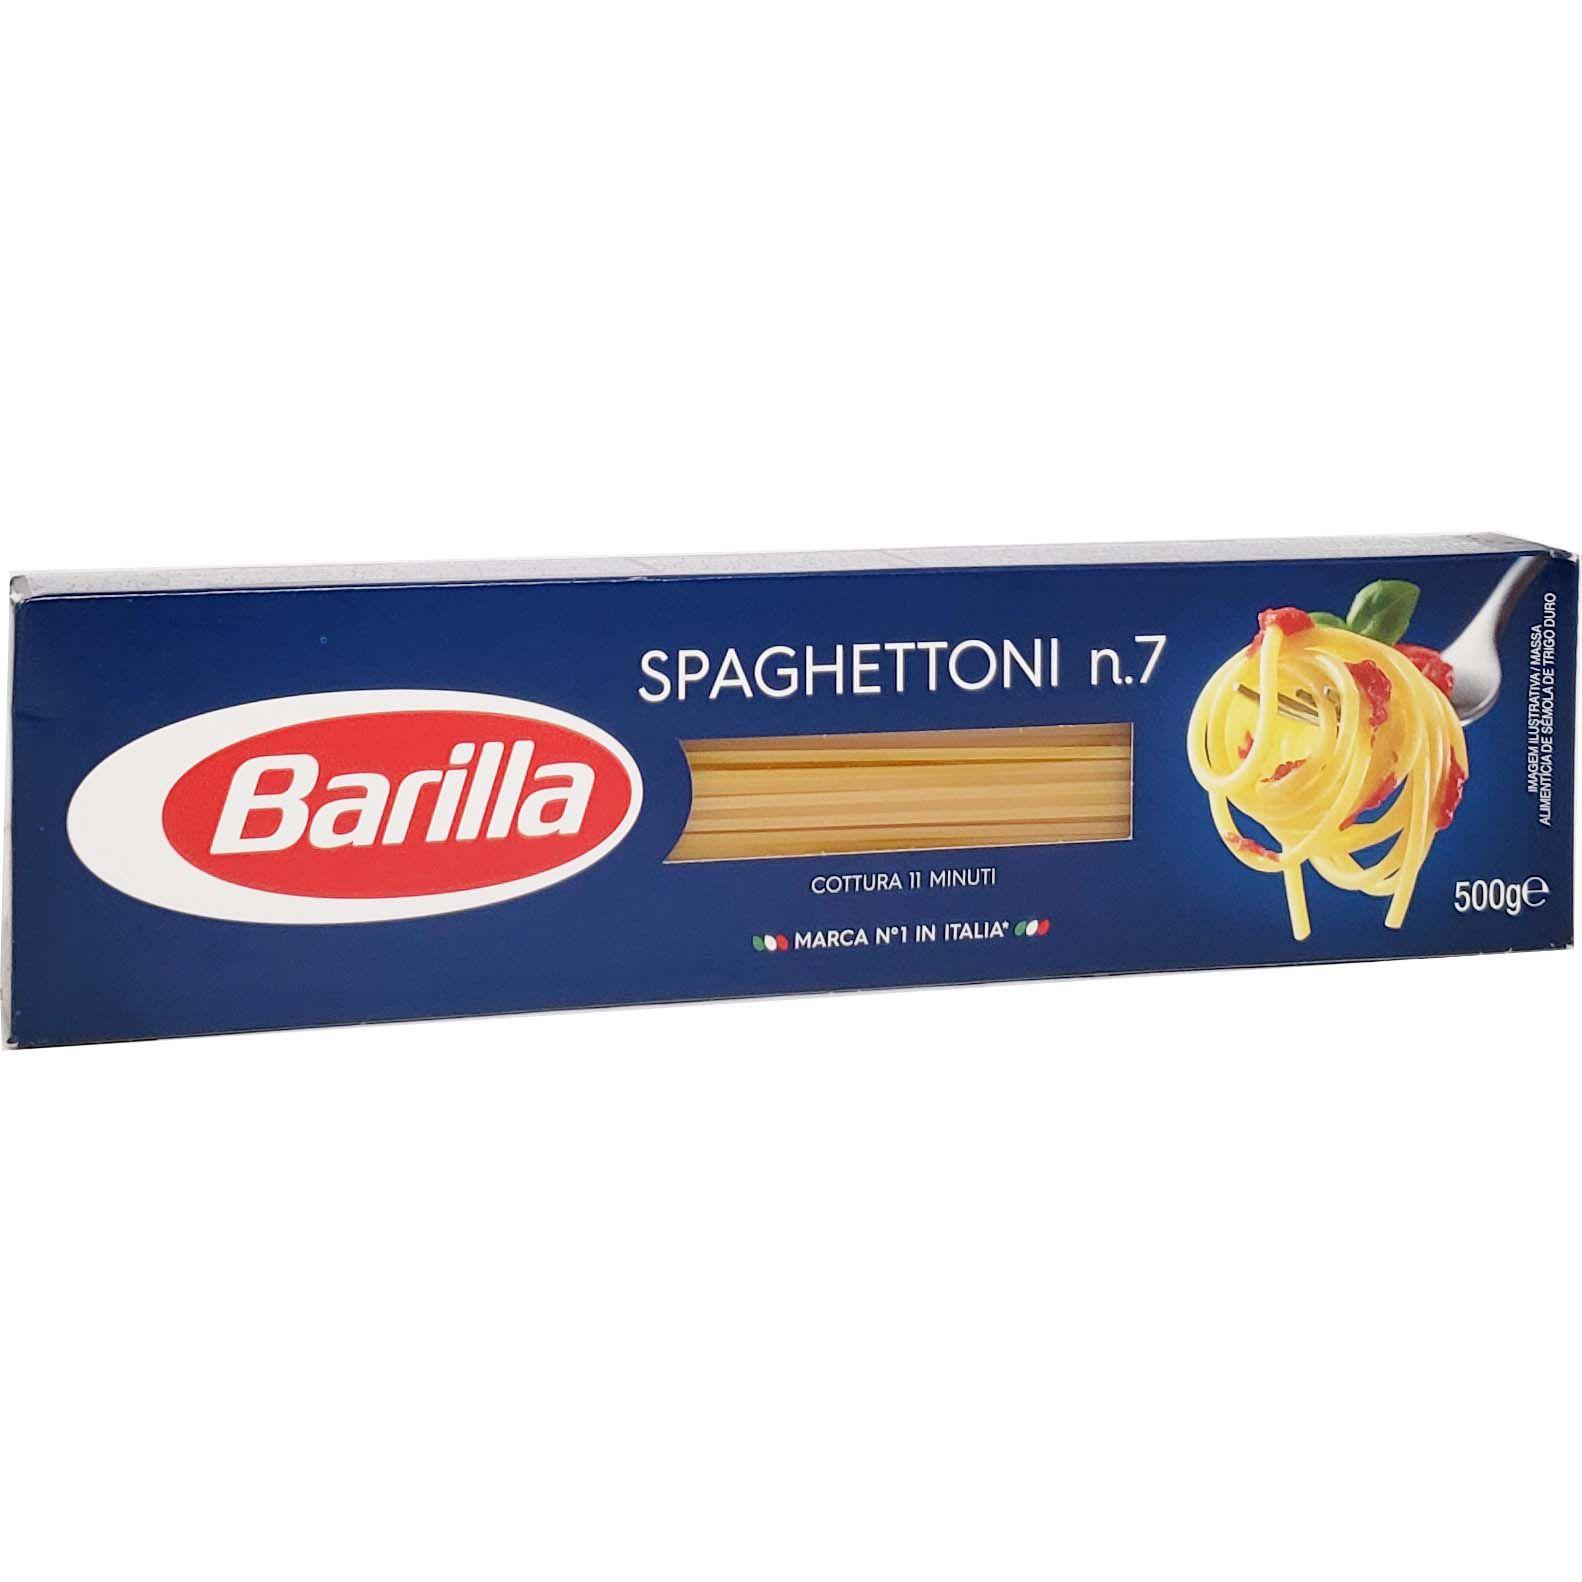 Macarrão Spaghettoni n.7 Barilla - 500g -